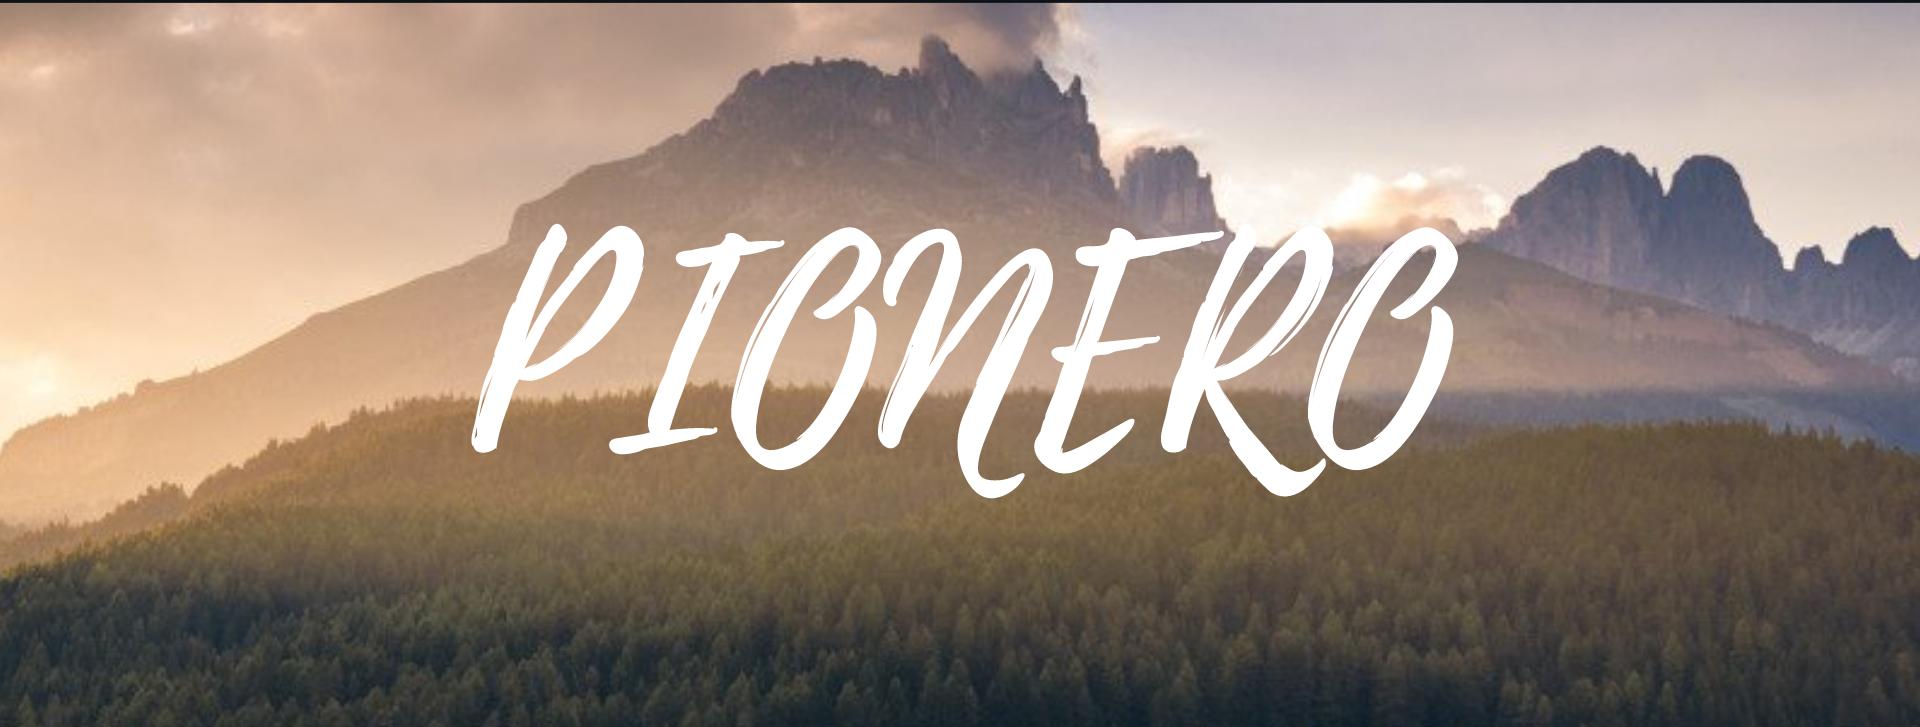 Pionero的宣傳圖片